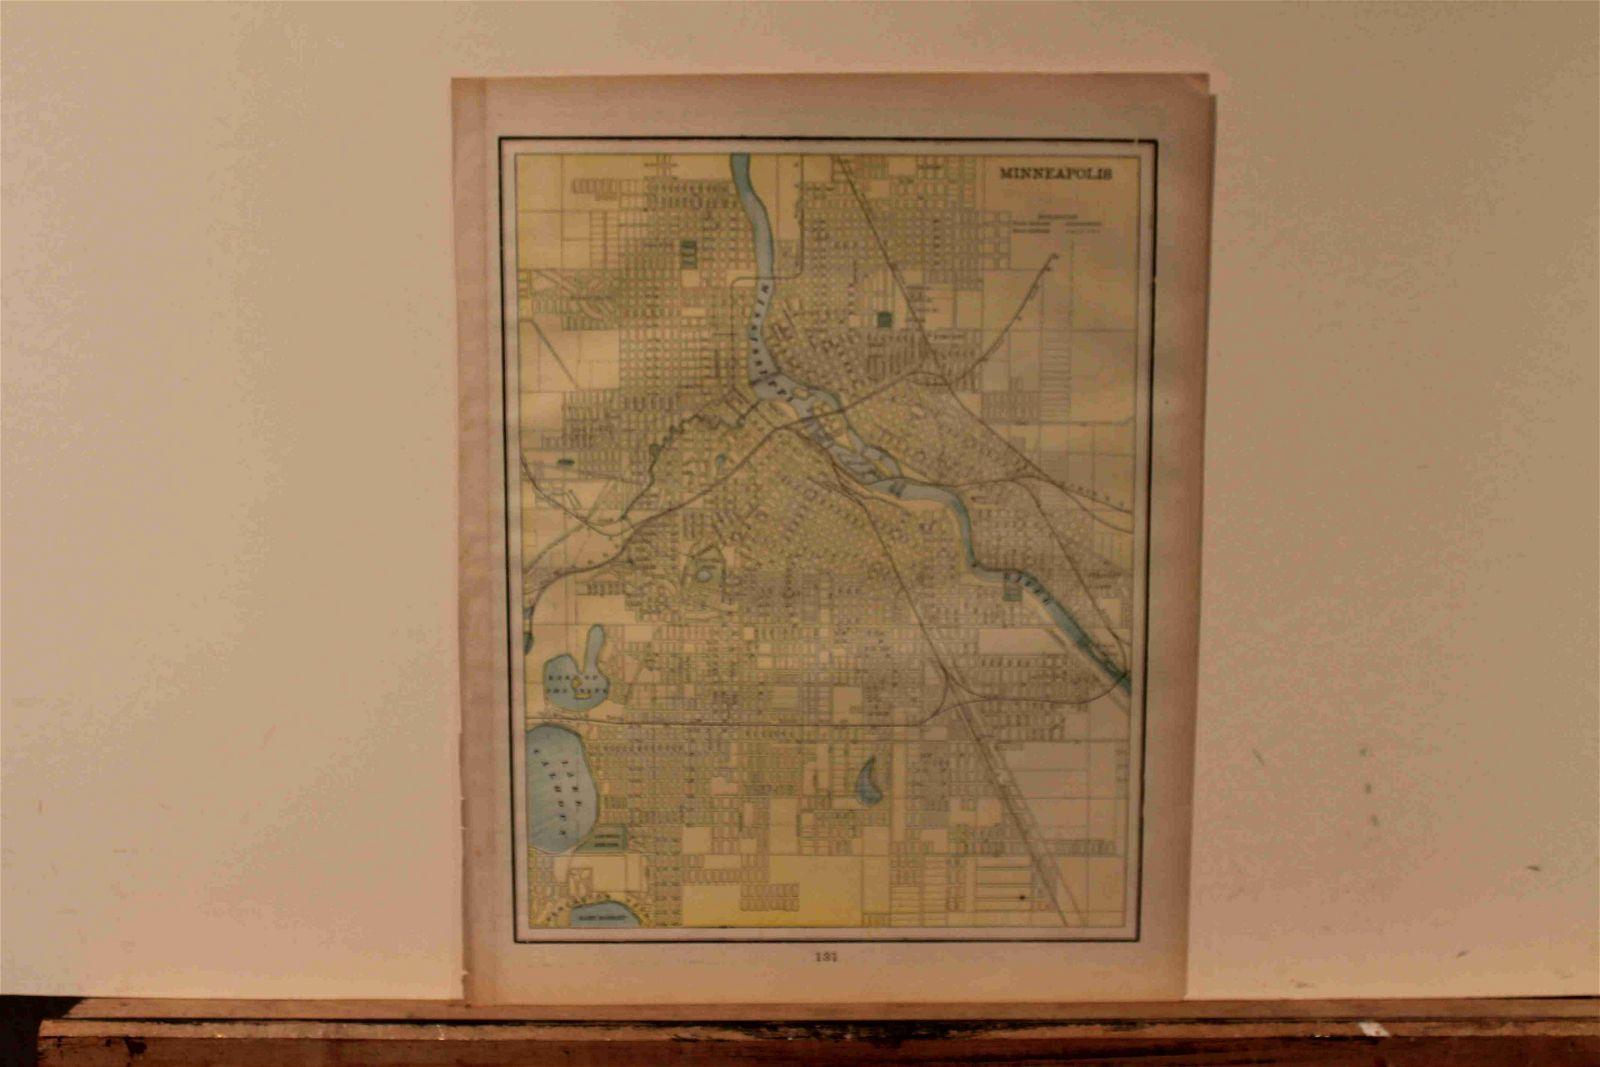 1897 Map of Minneapolis